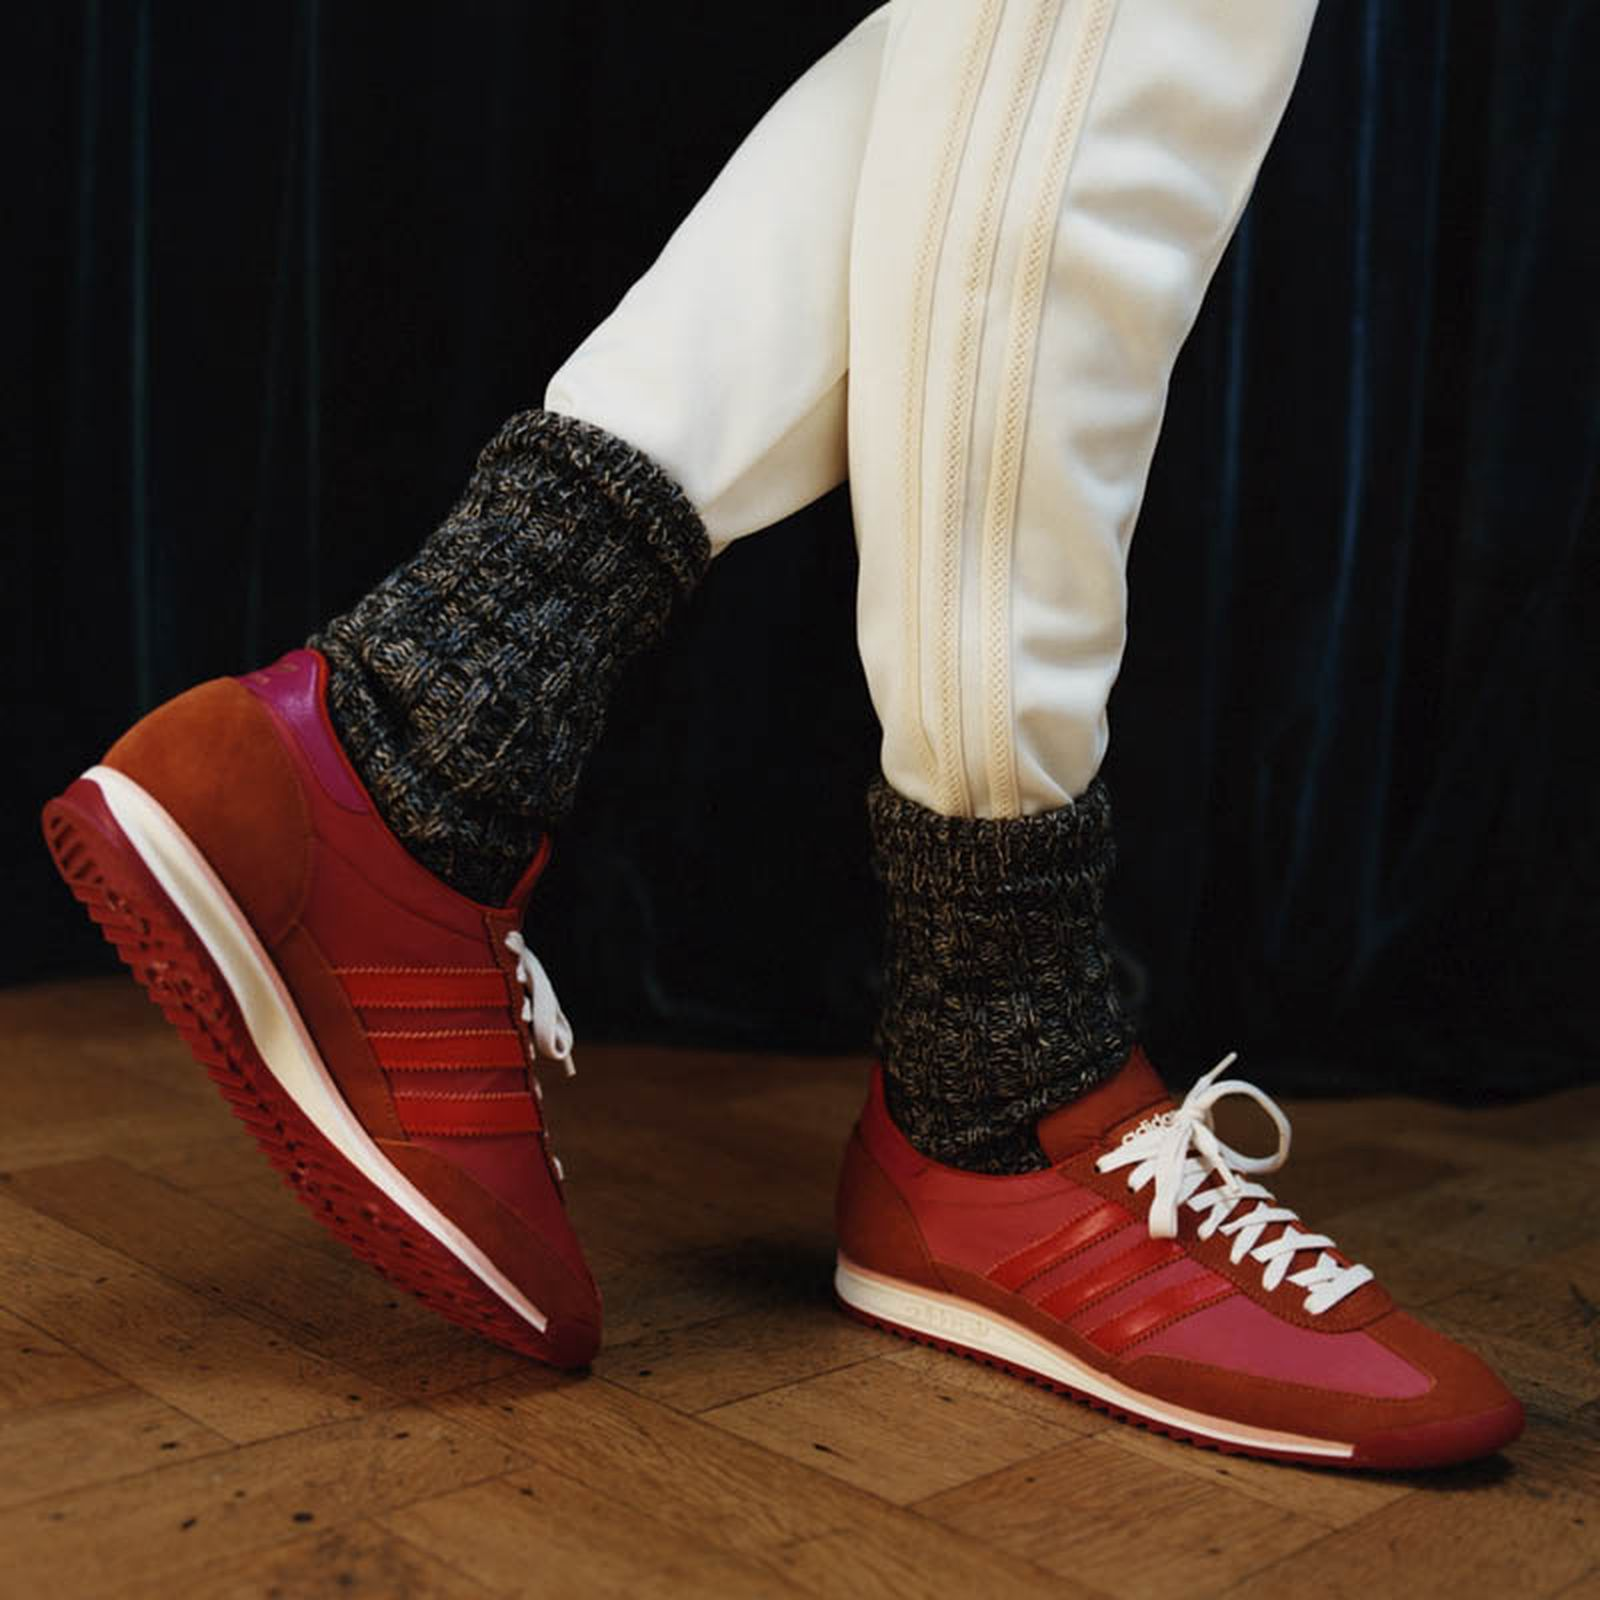 wales-bonner-adidas-originals-samba-release-date-price-campaign-010